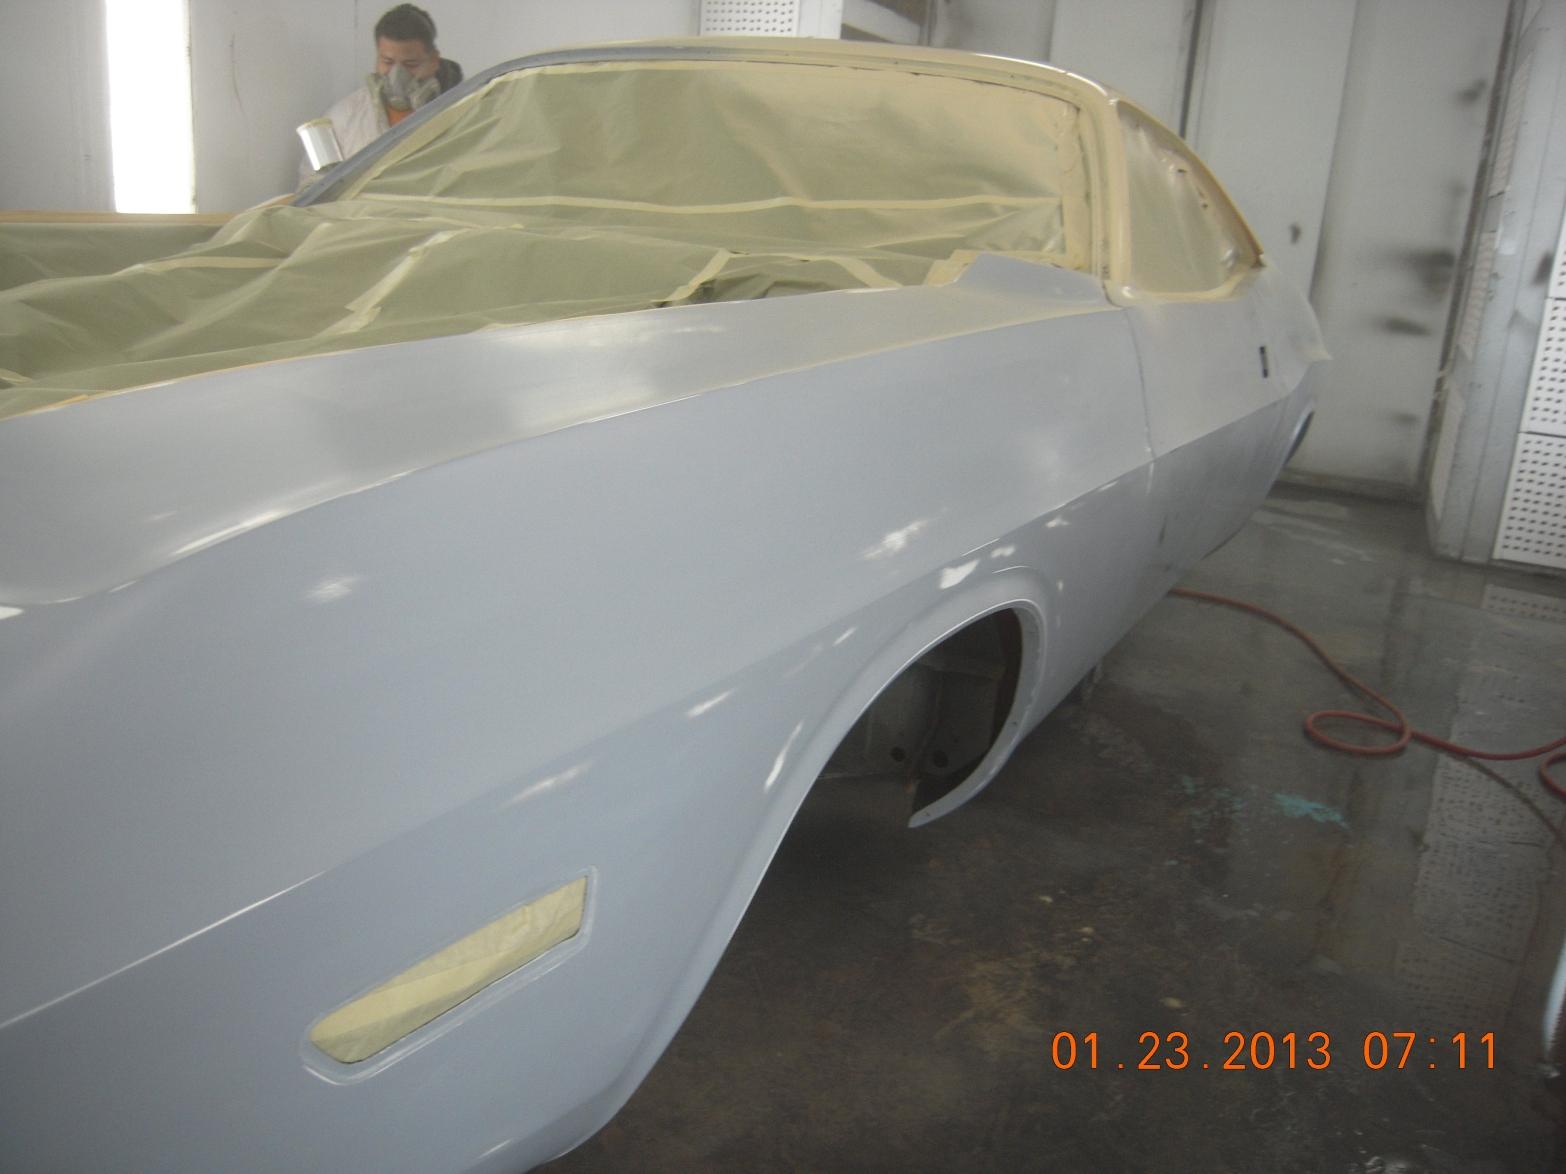 west-coast-body-and-paint-orange-1970-challenger-93